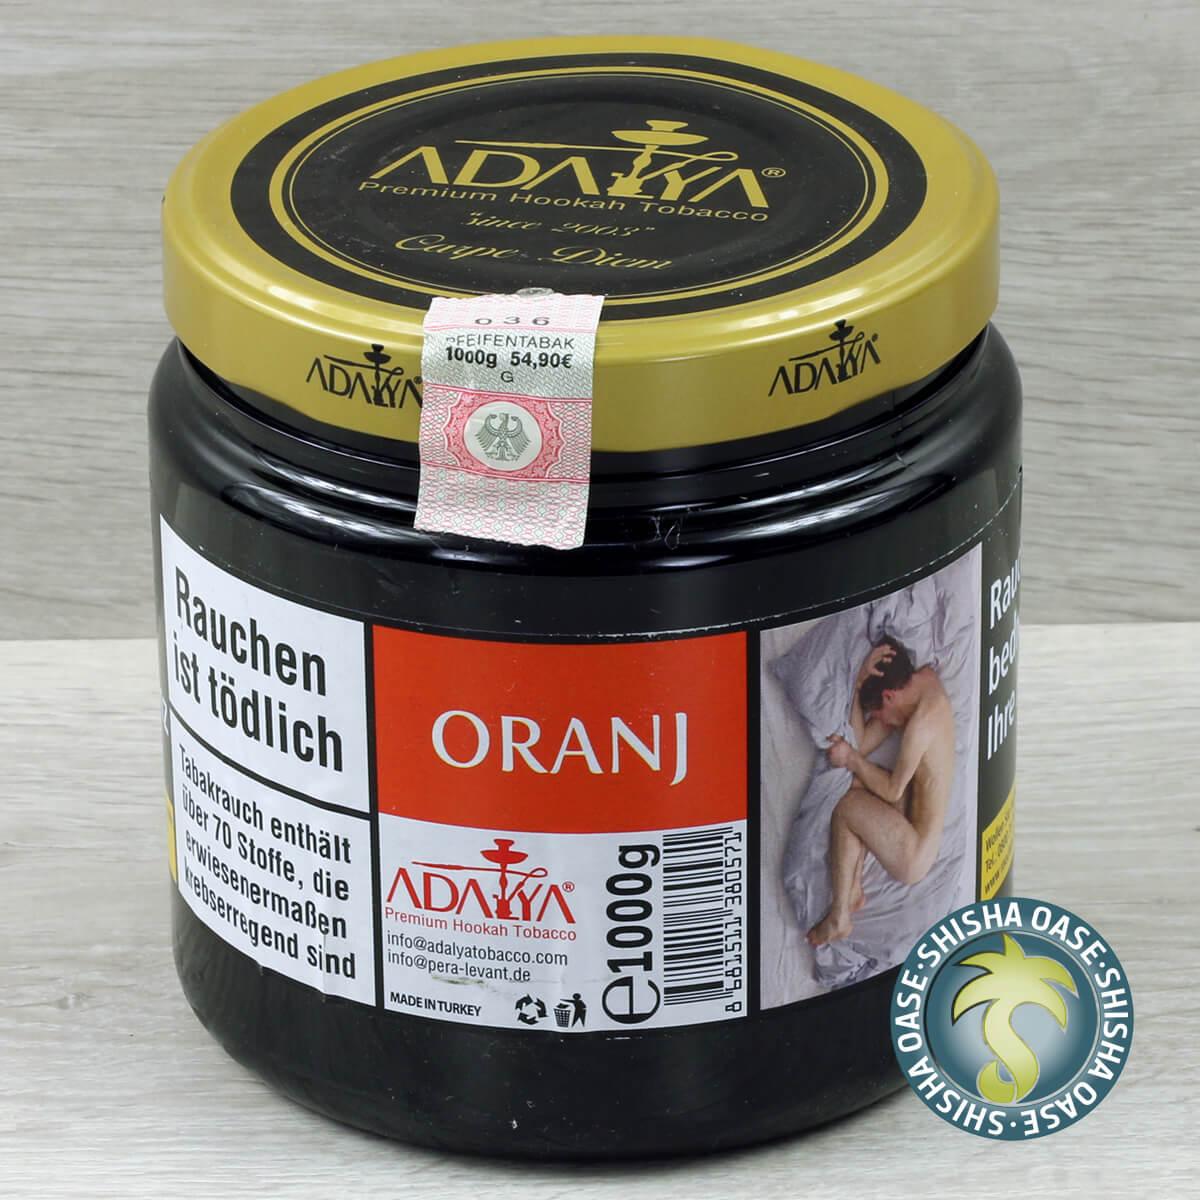 Adalya Tabak Oranj 1kg Dose